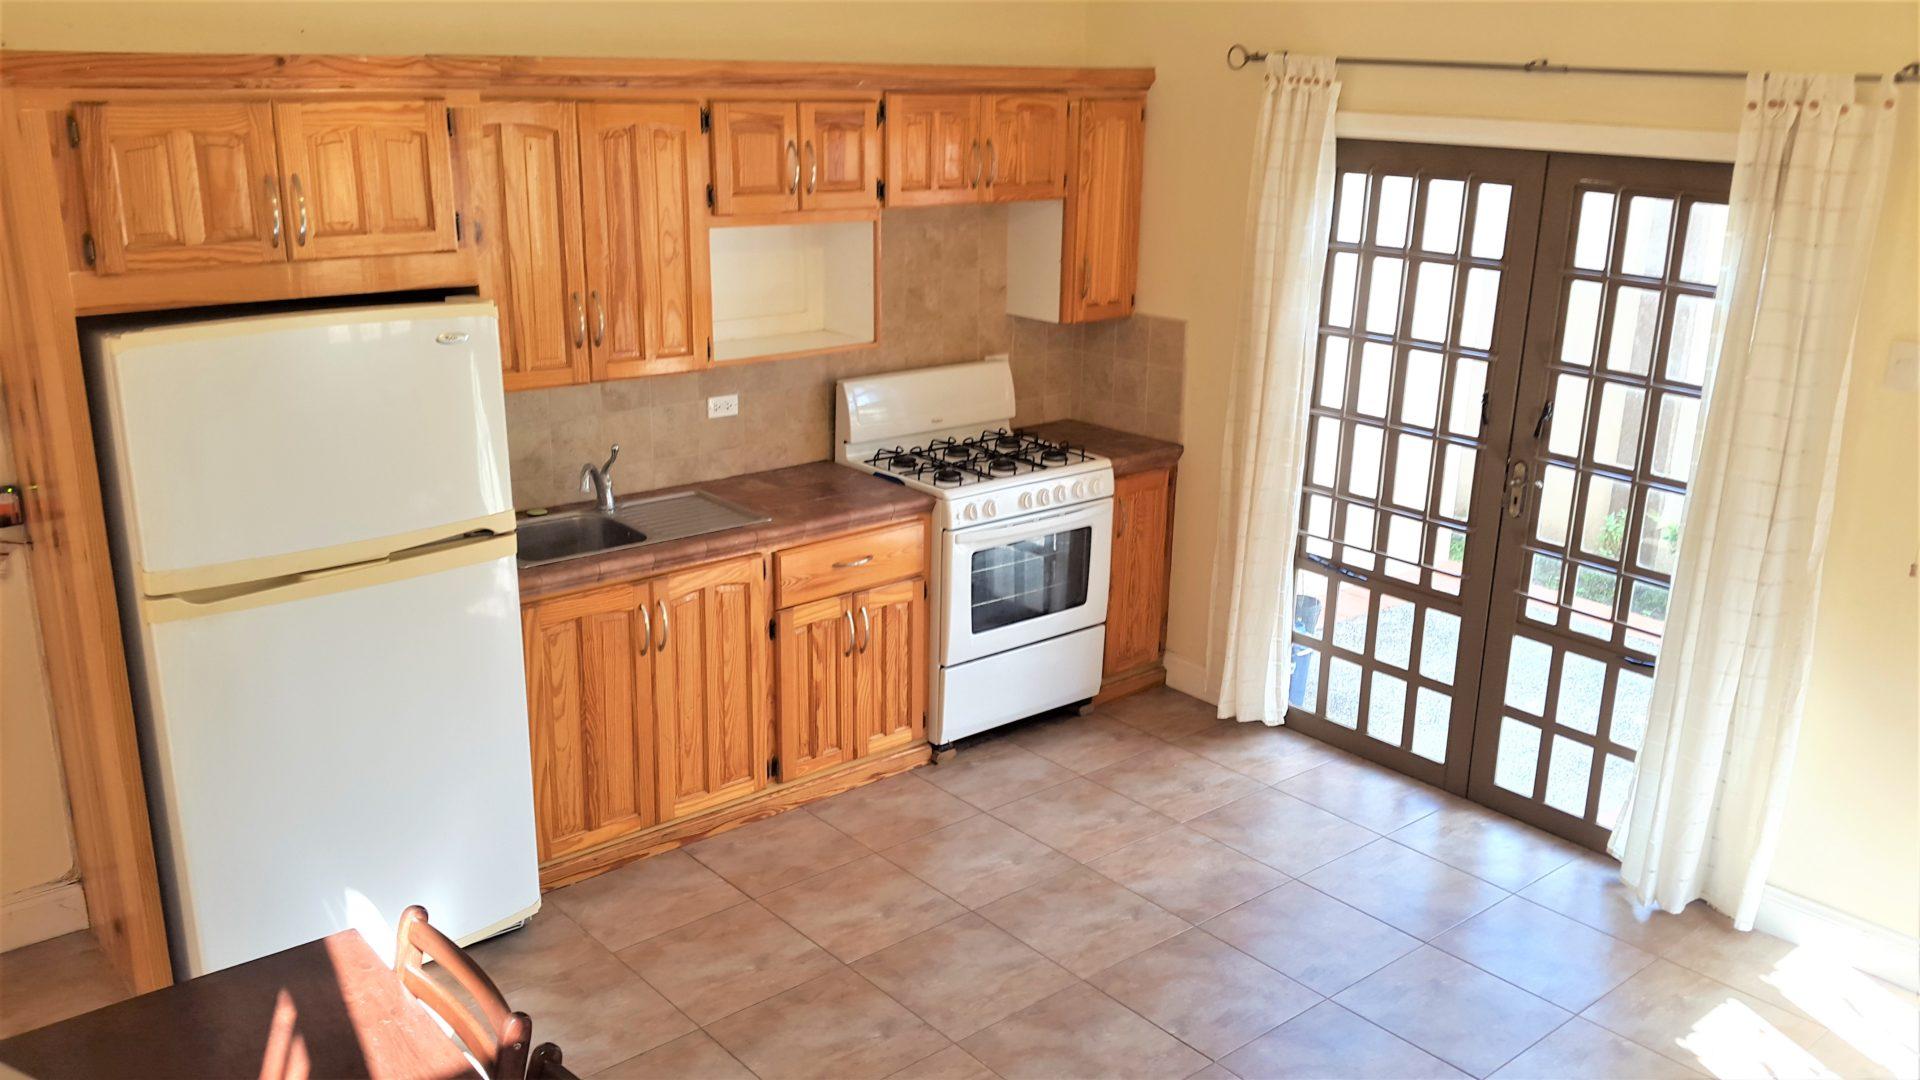 3 B/Room Townhouse – Woodbrook – $7,000